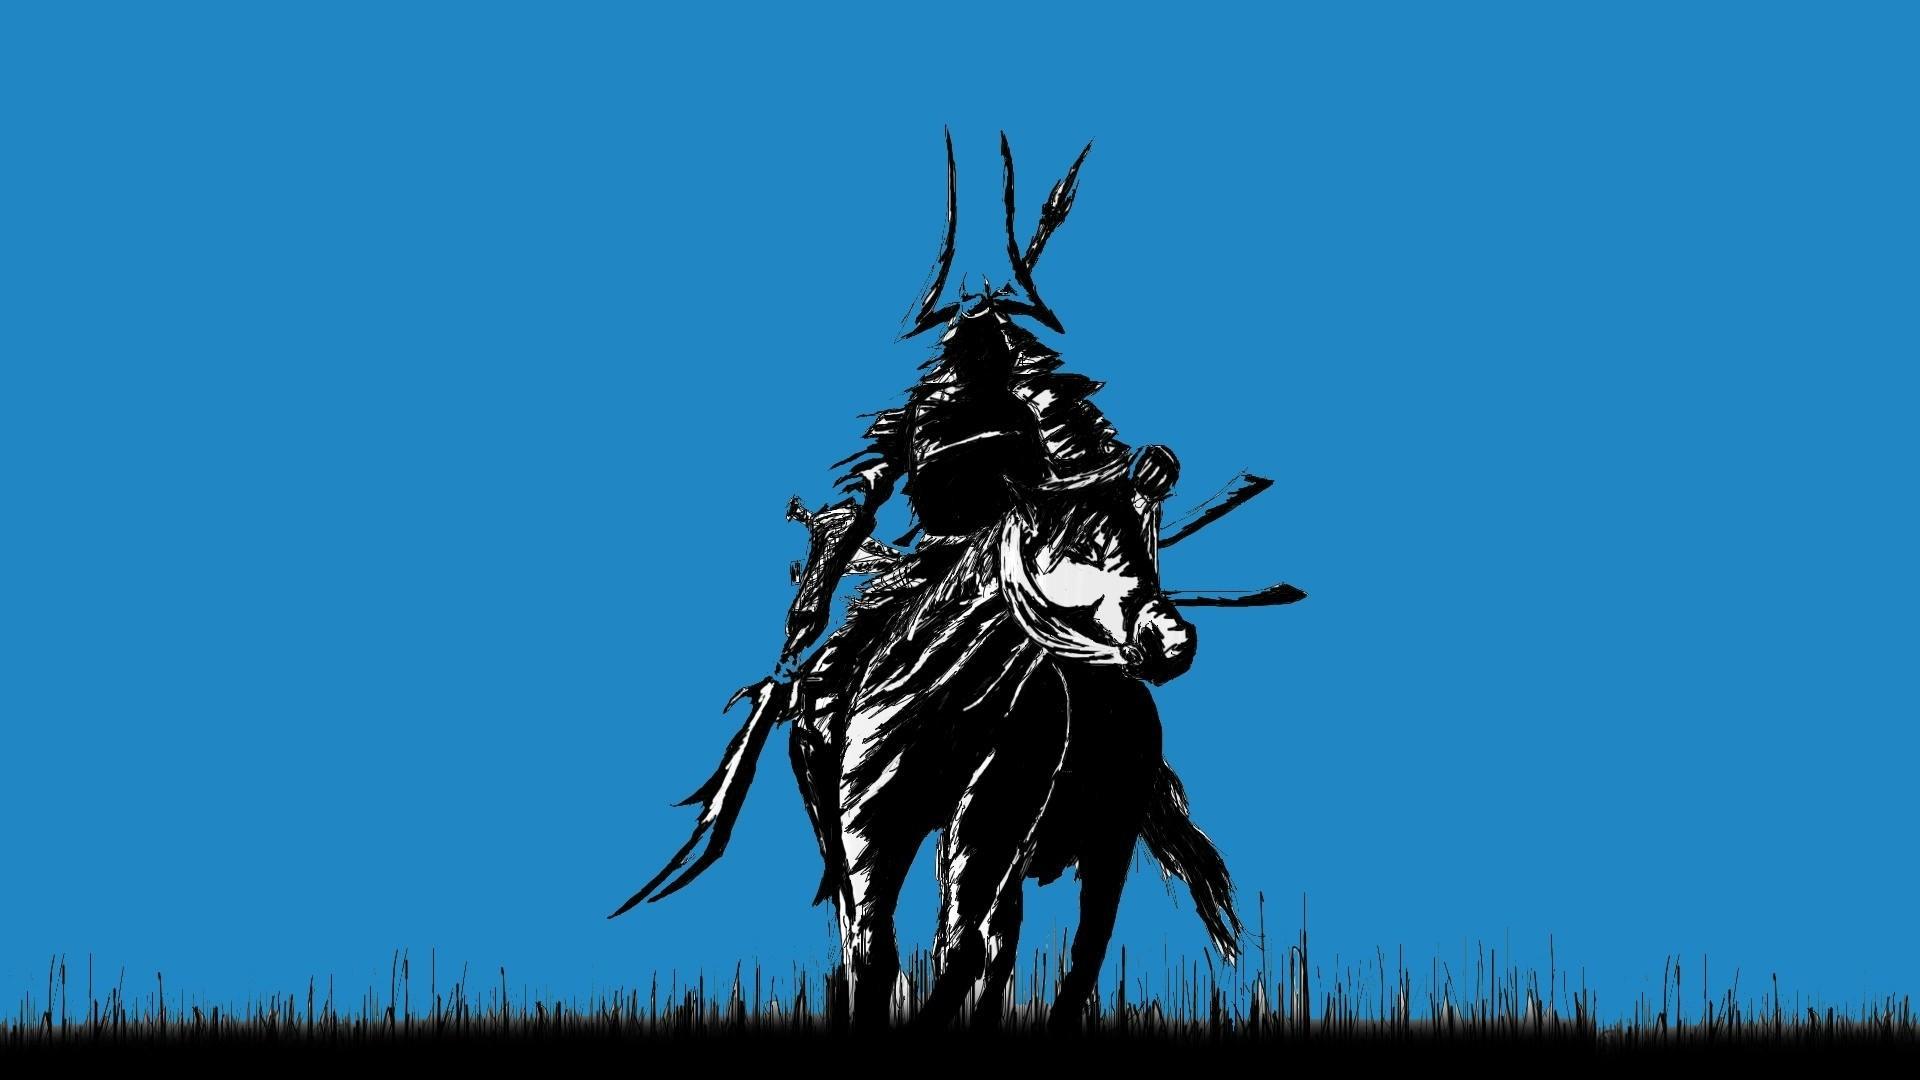 Free computer samurai